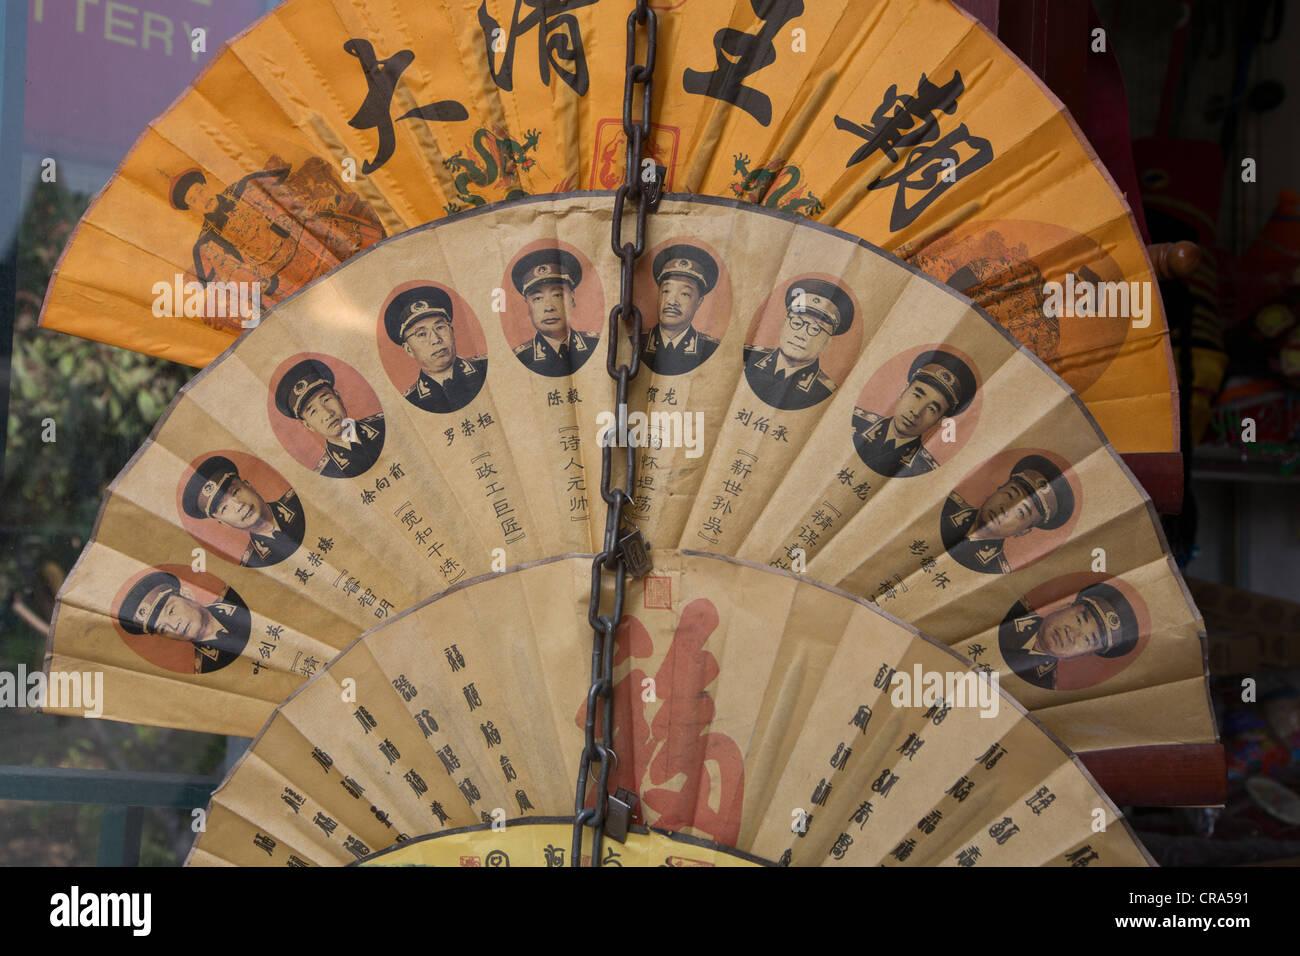 Lüfter mit militärischen Porträts, in Peking, China. Stockbild